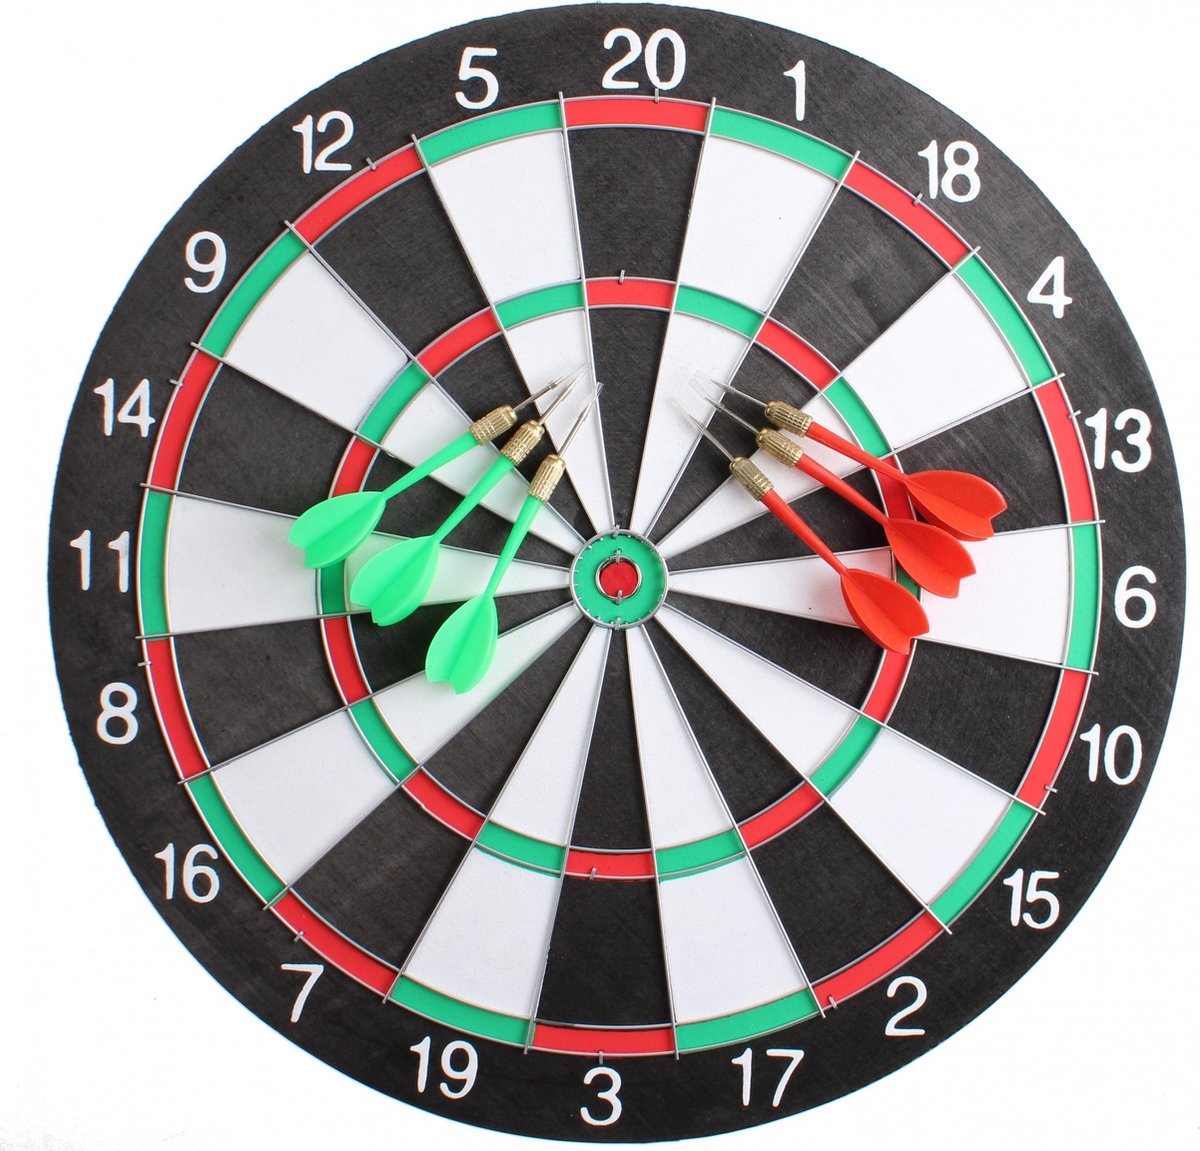 Master Darts Dartbord 40,5 Cm Met 6 Pijlen